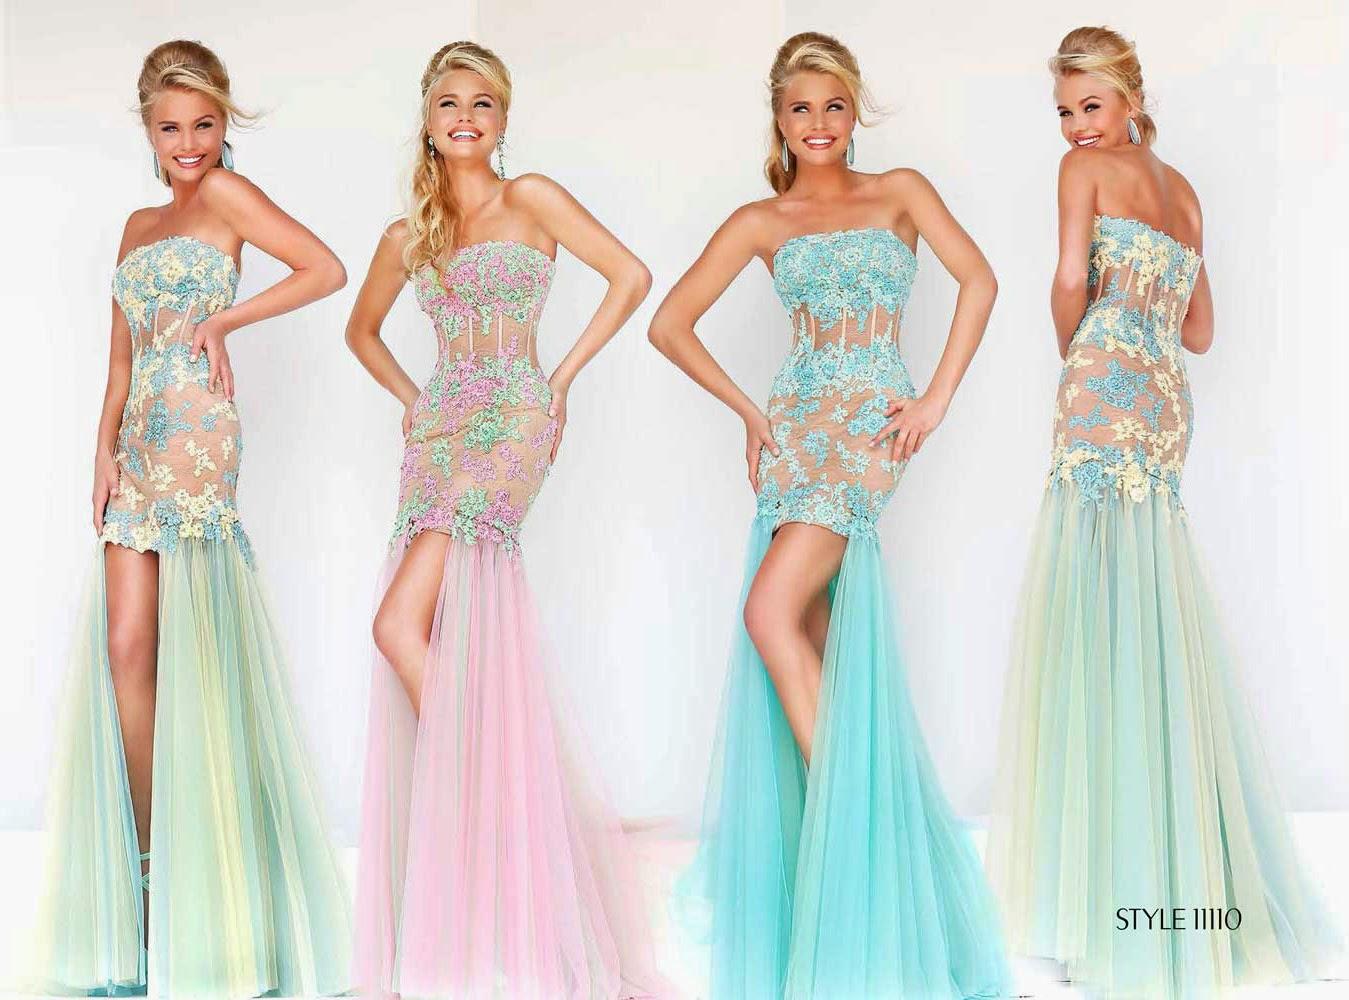 Comprar Vestidos Sexys de Mujer Baratos Luz de Moda